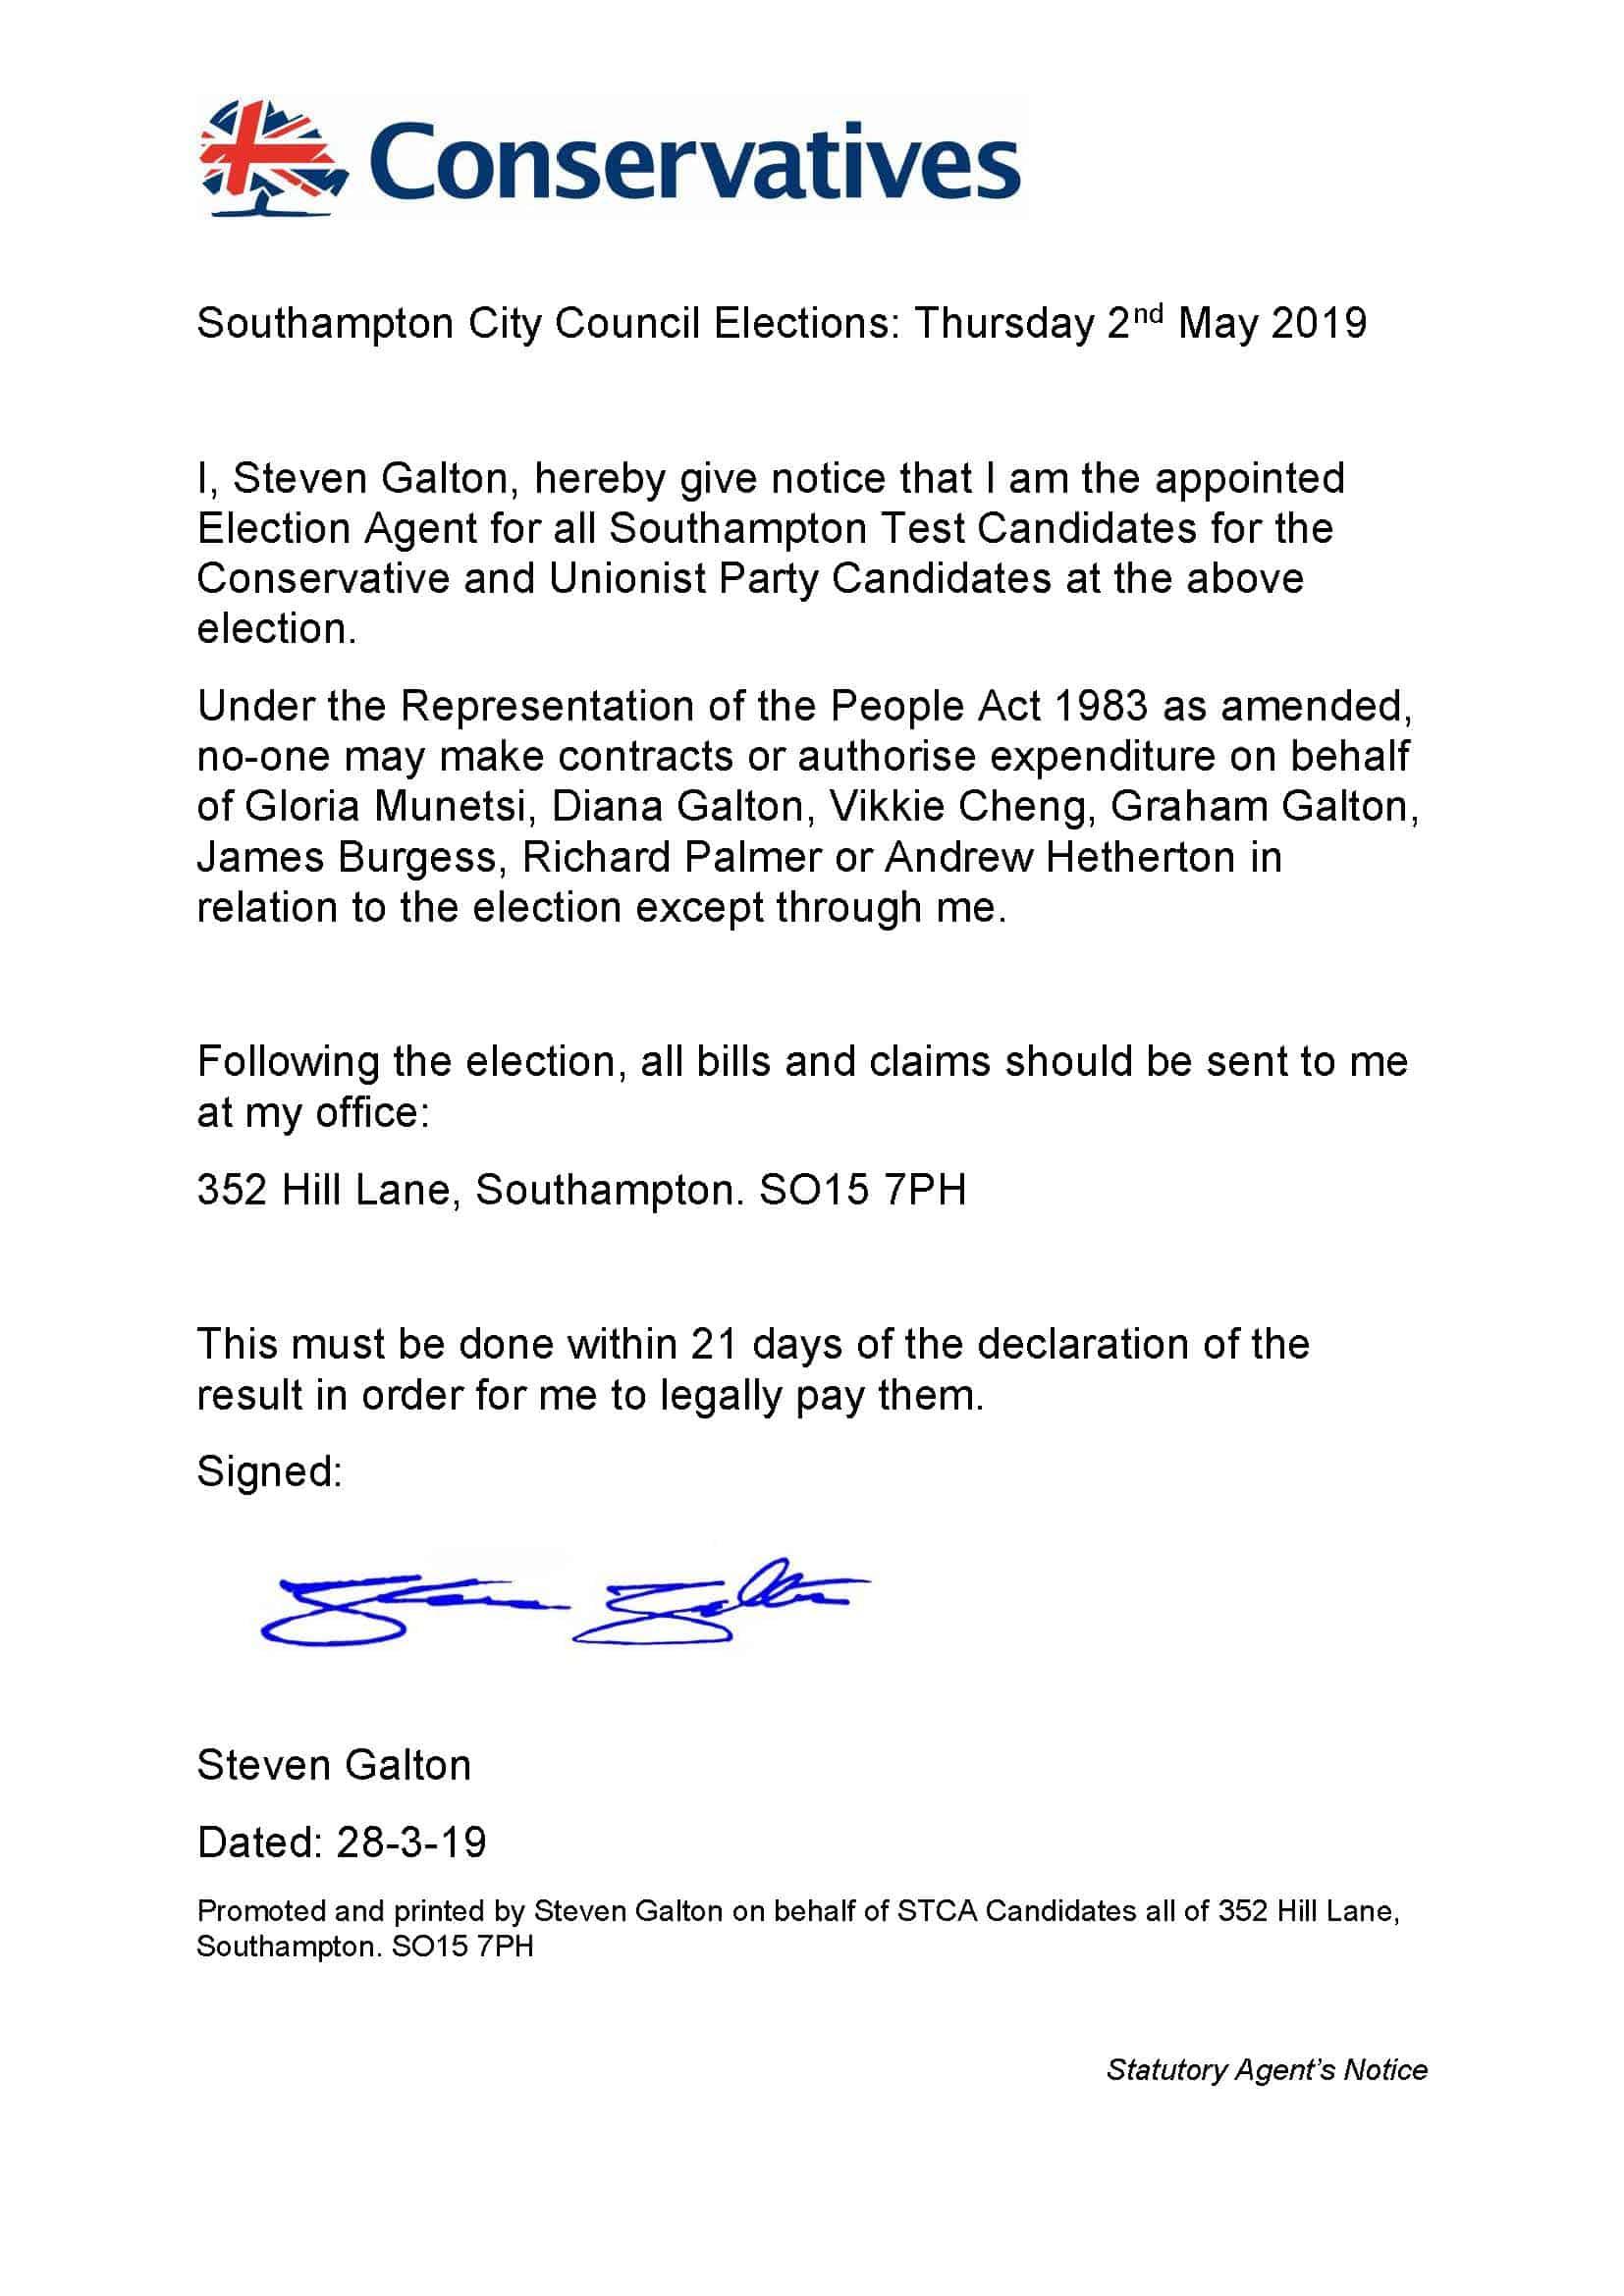 STCA Agents' Statutory Notice